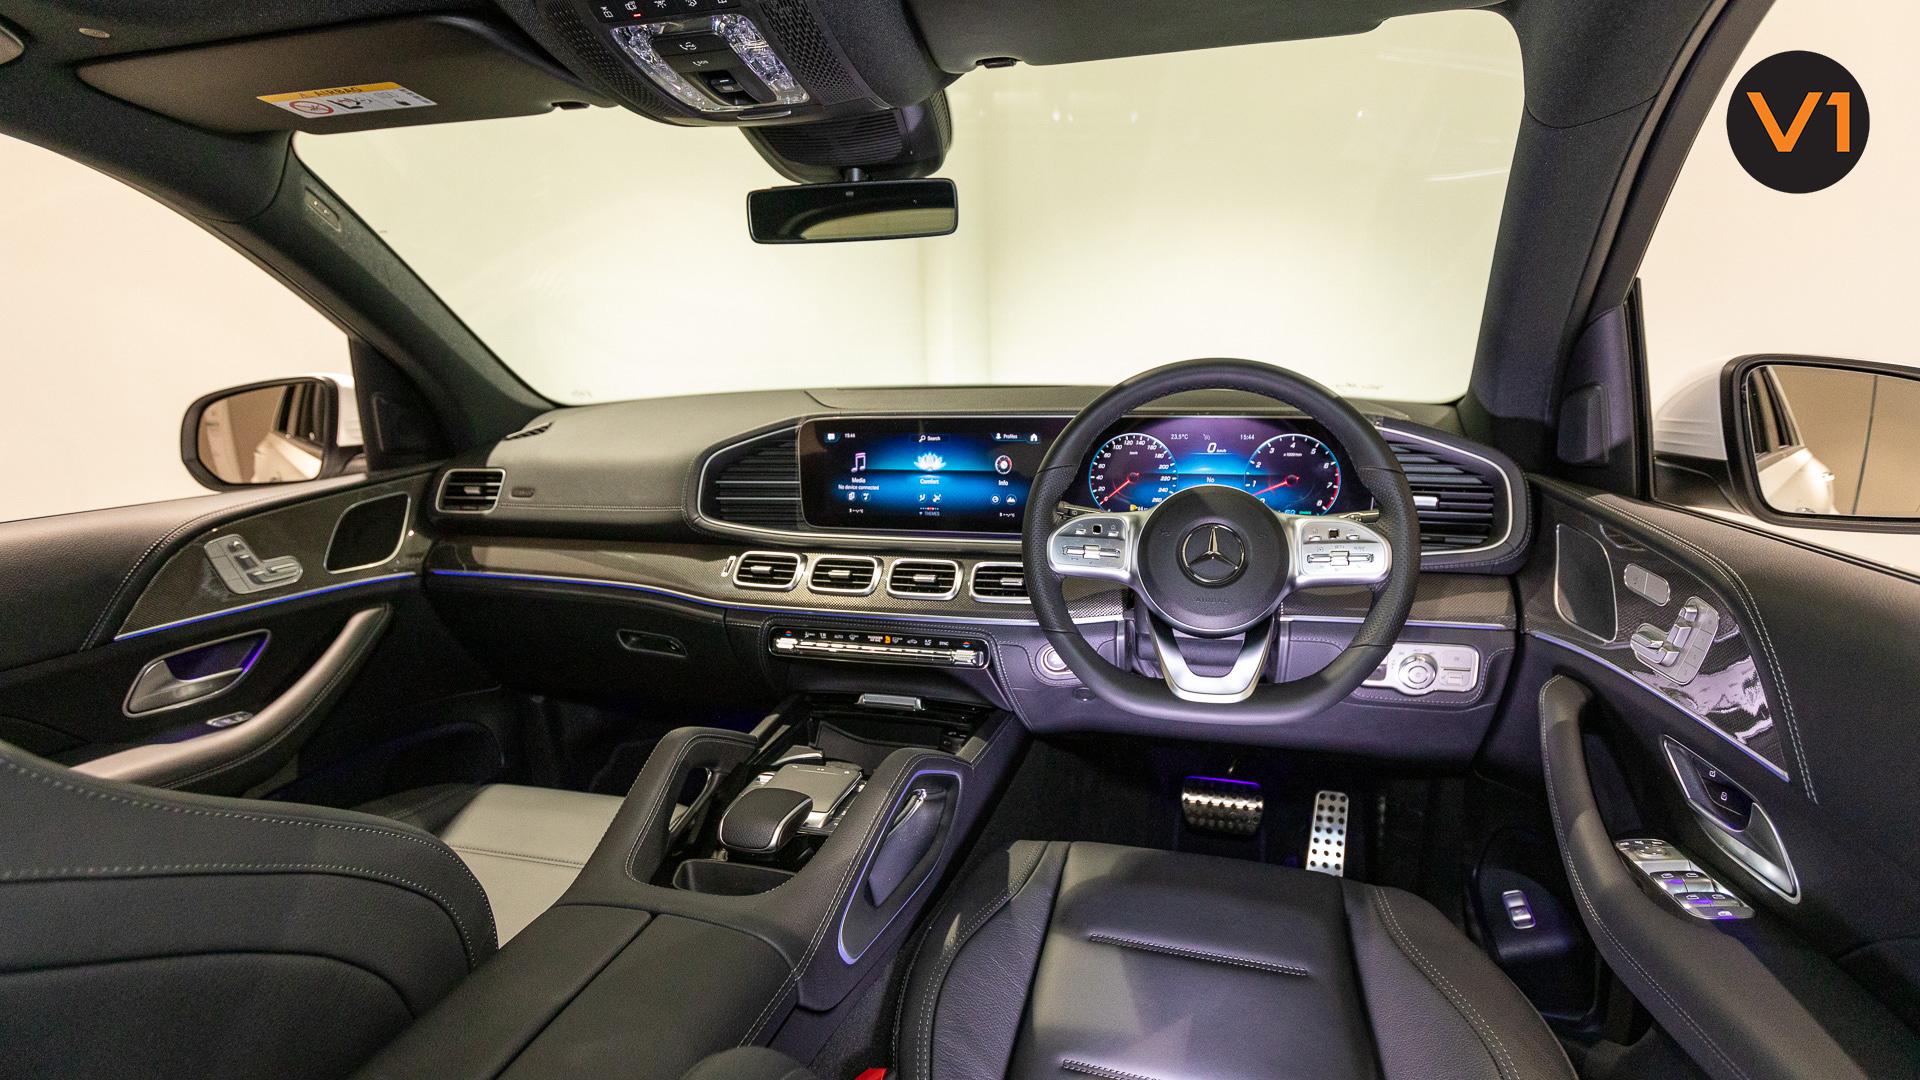 MERCEDES-BENZ GLE450 AMG 4MATIC LUXURY - Interior Dash